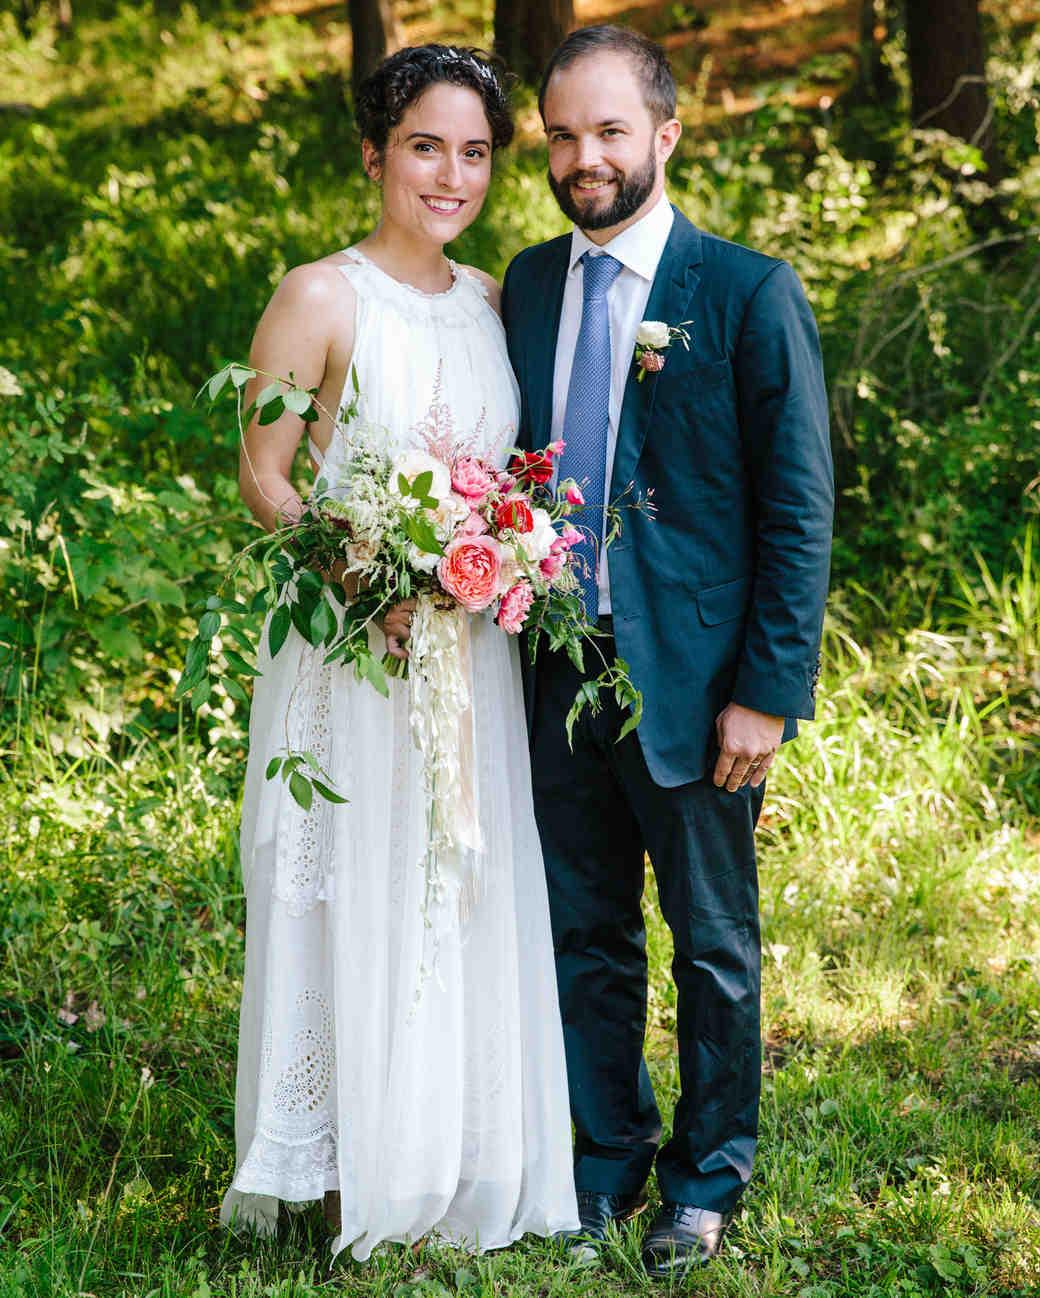 rachel-andrew-wedding-couple-097-s112195-0915.jpg